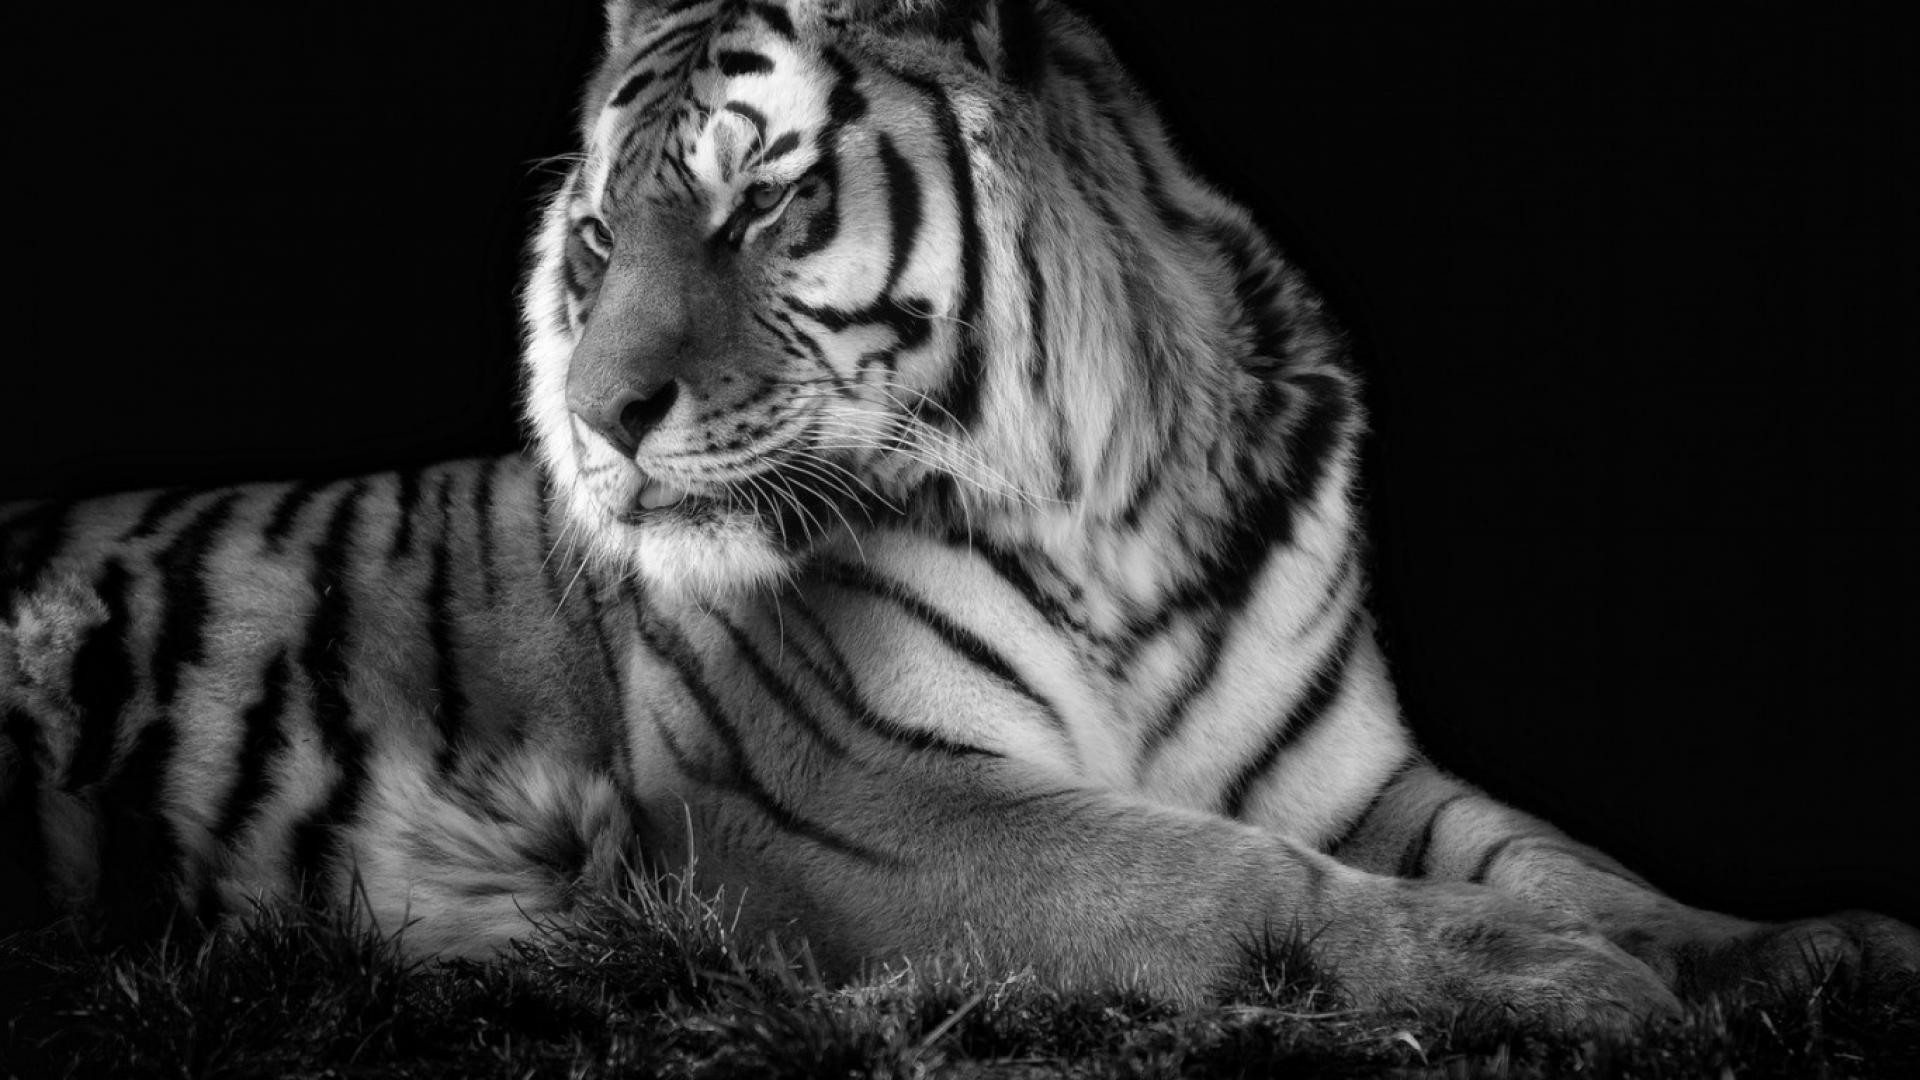 Tigers white tiger wallpaper